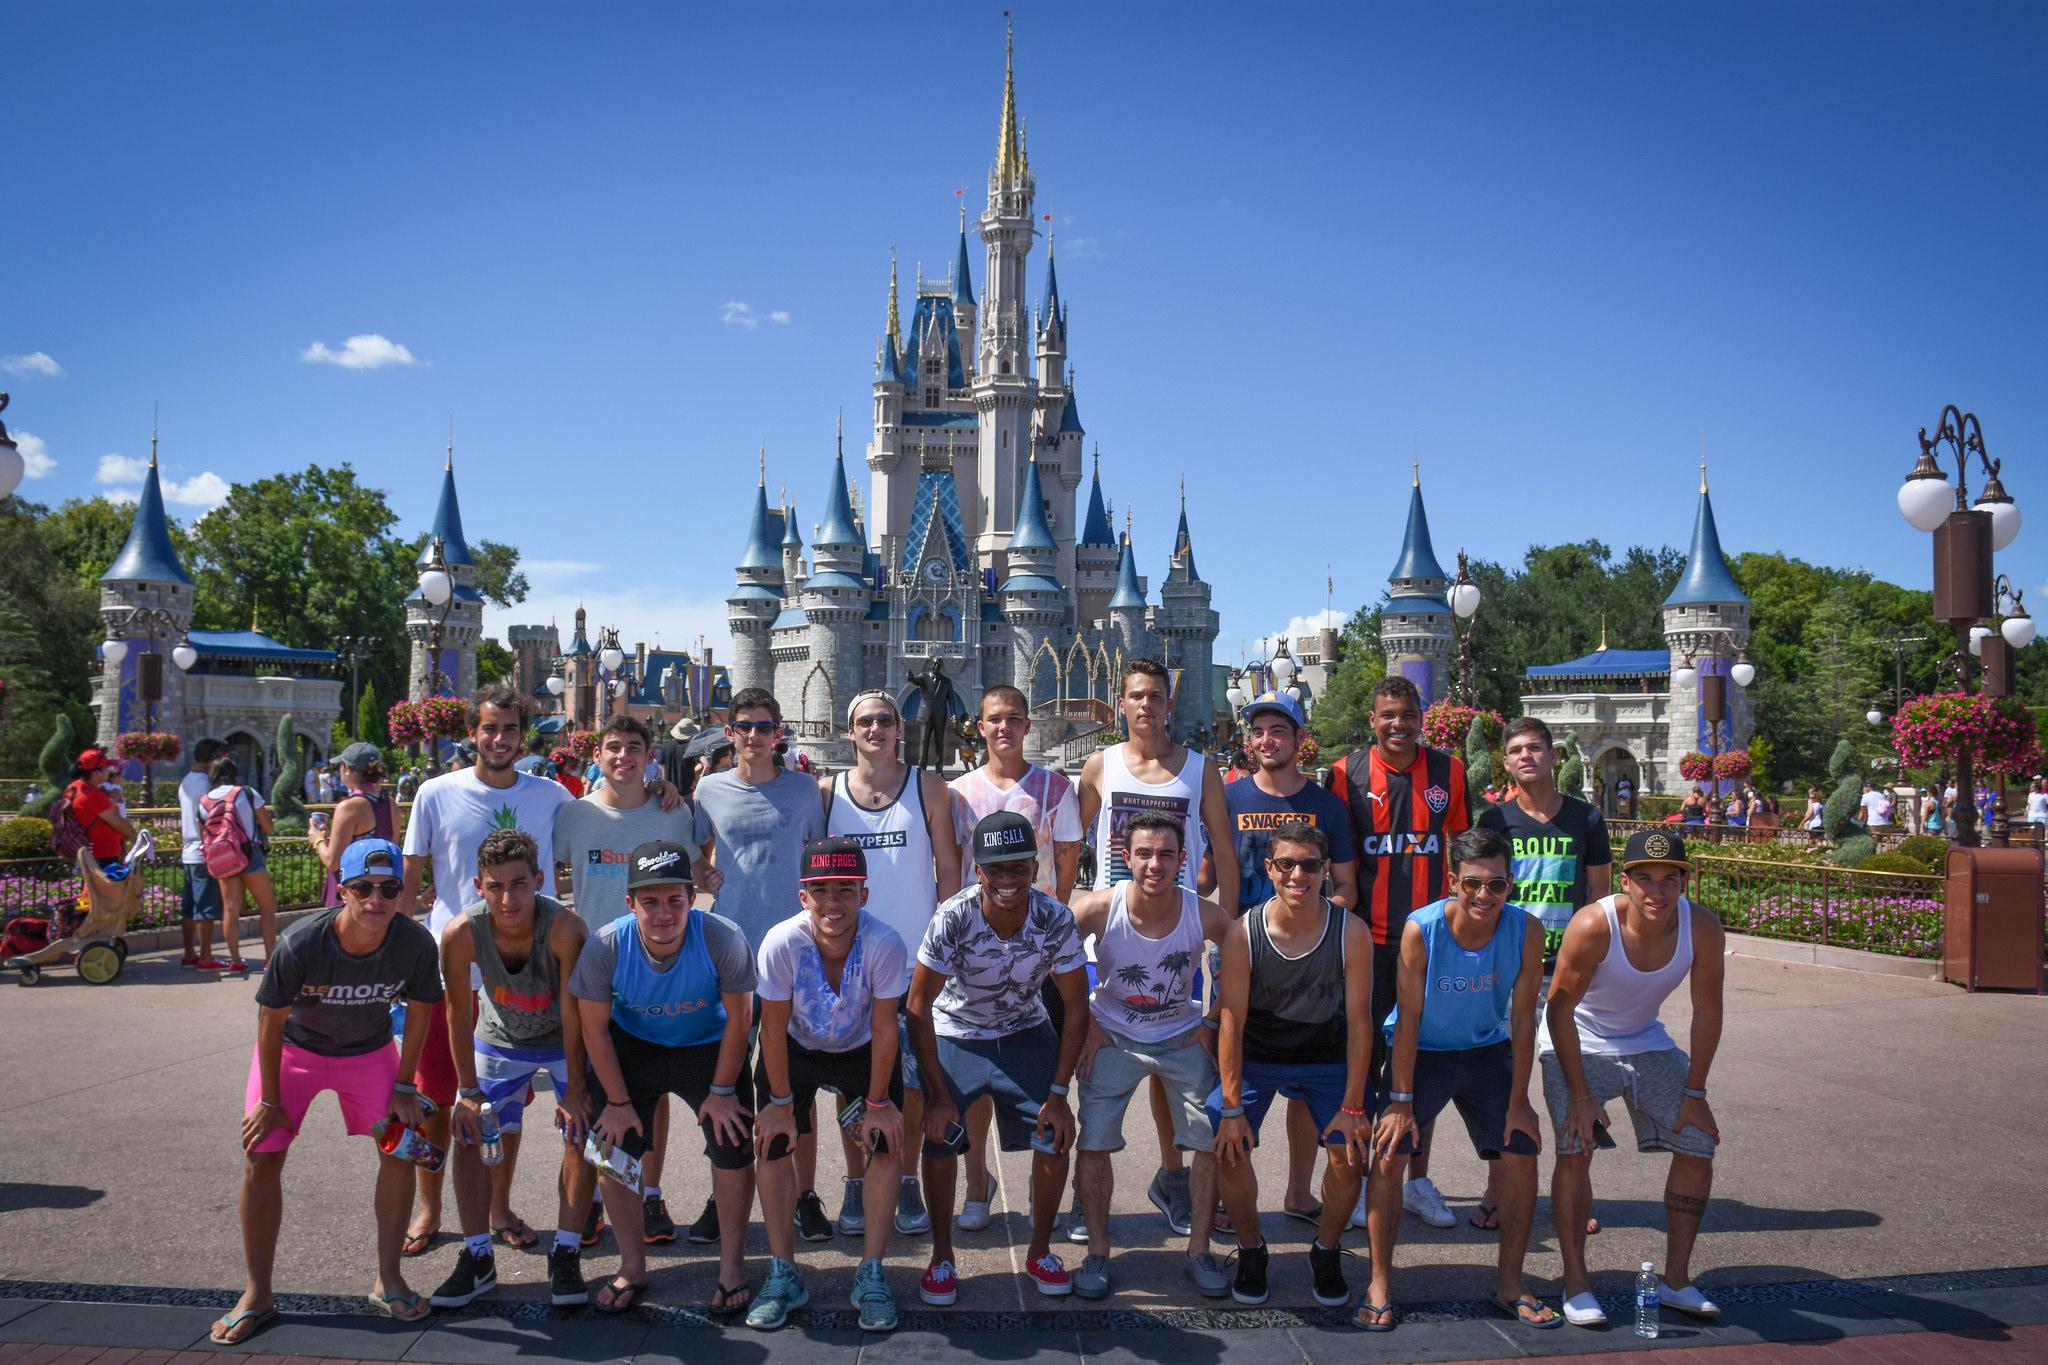 equipe futebol magic kingdom go usa